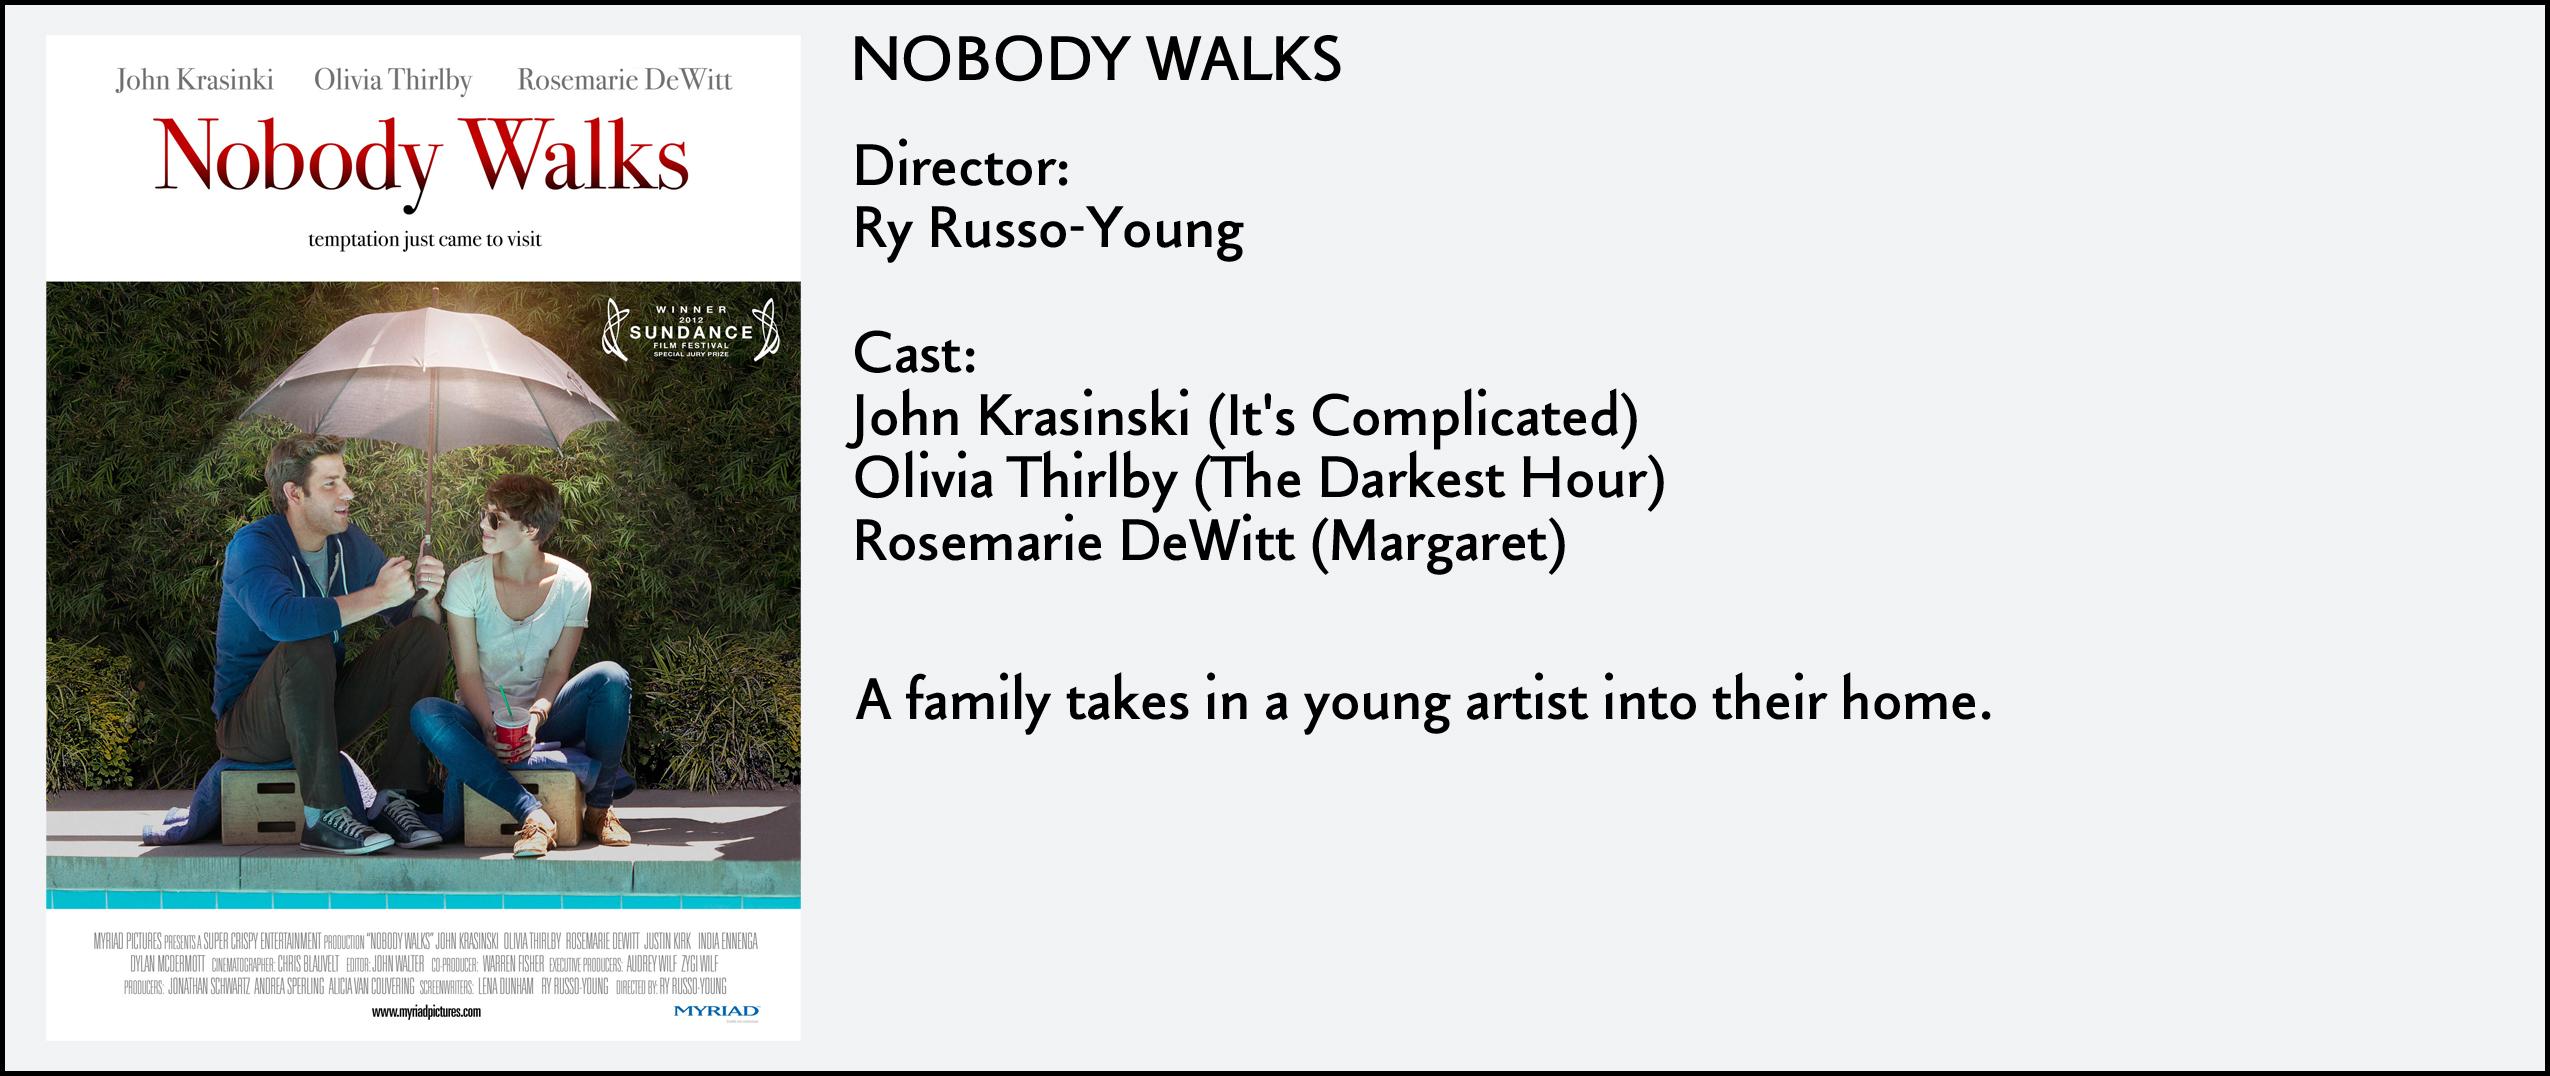 Nobodys Walks